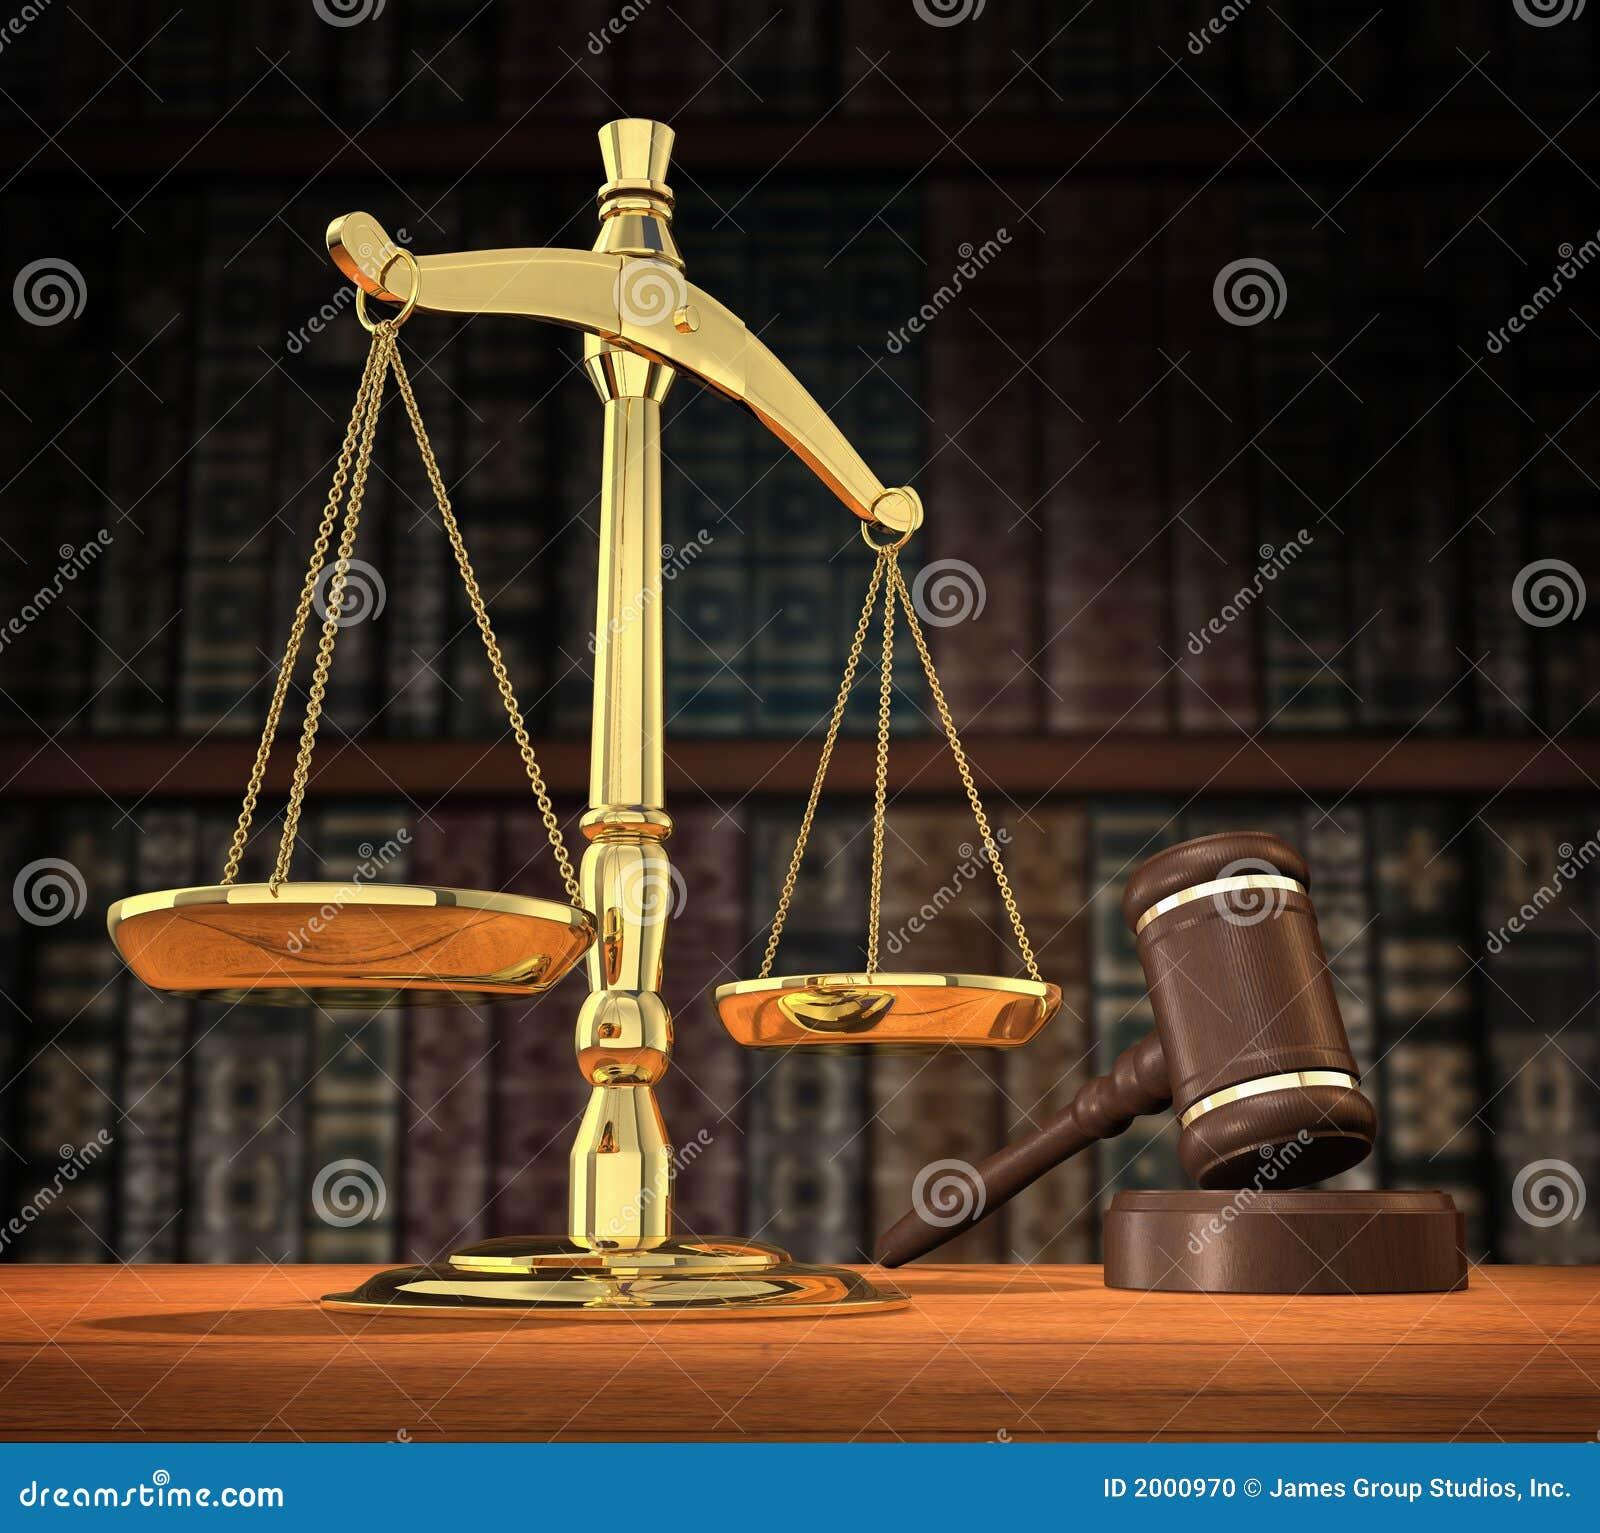 Justiça é serida